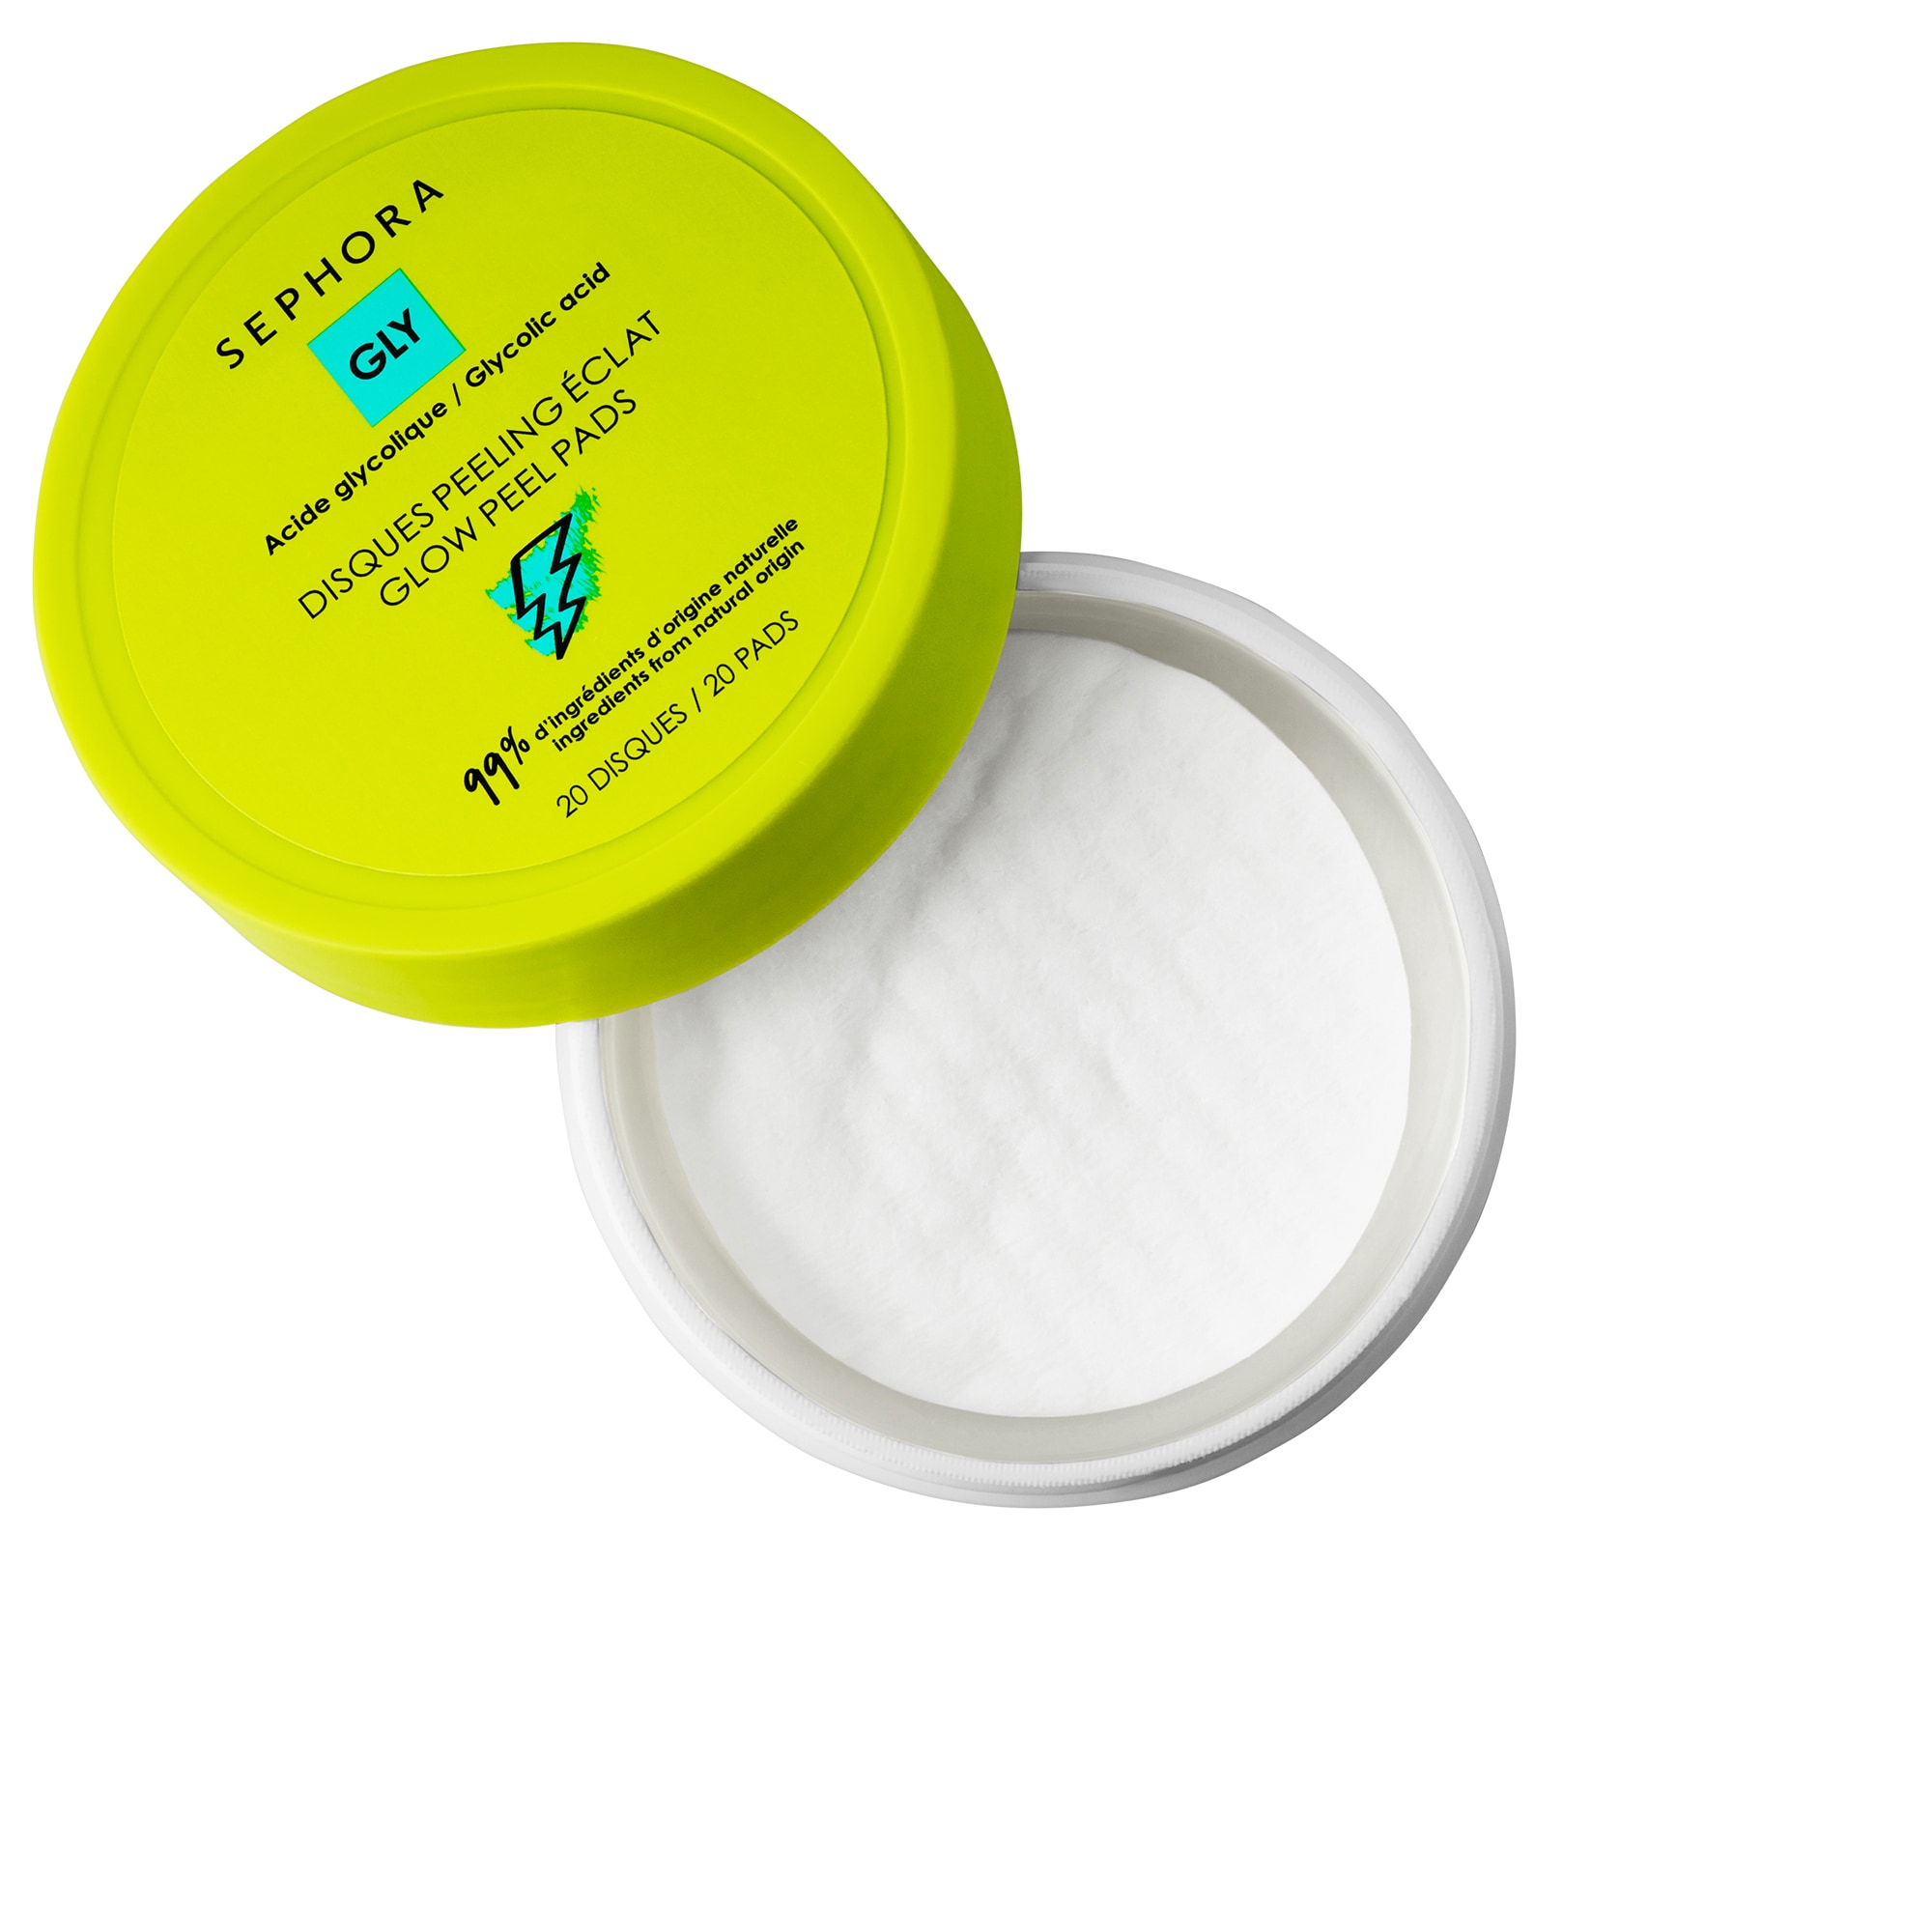 Sephora - Mini Glow Peel Pads